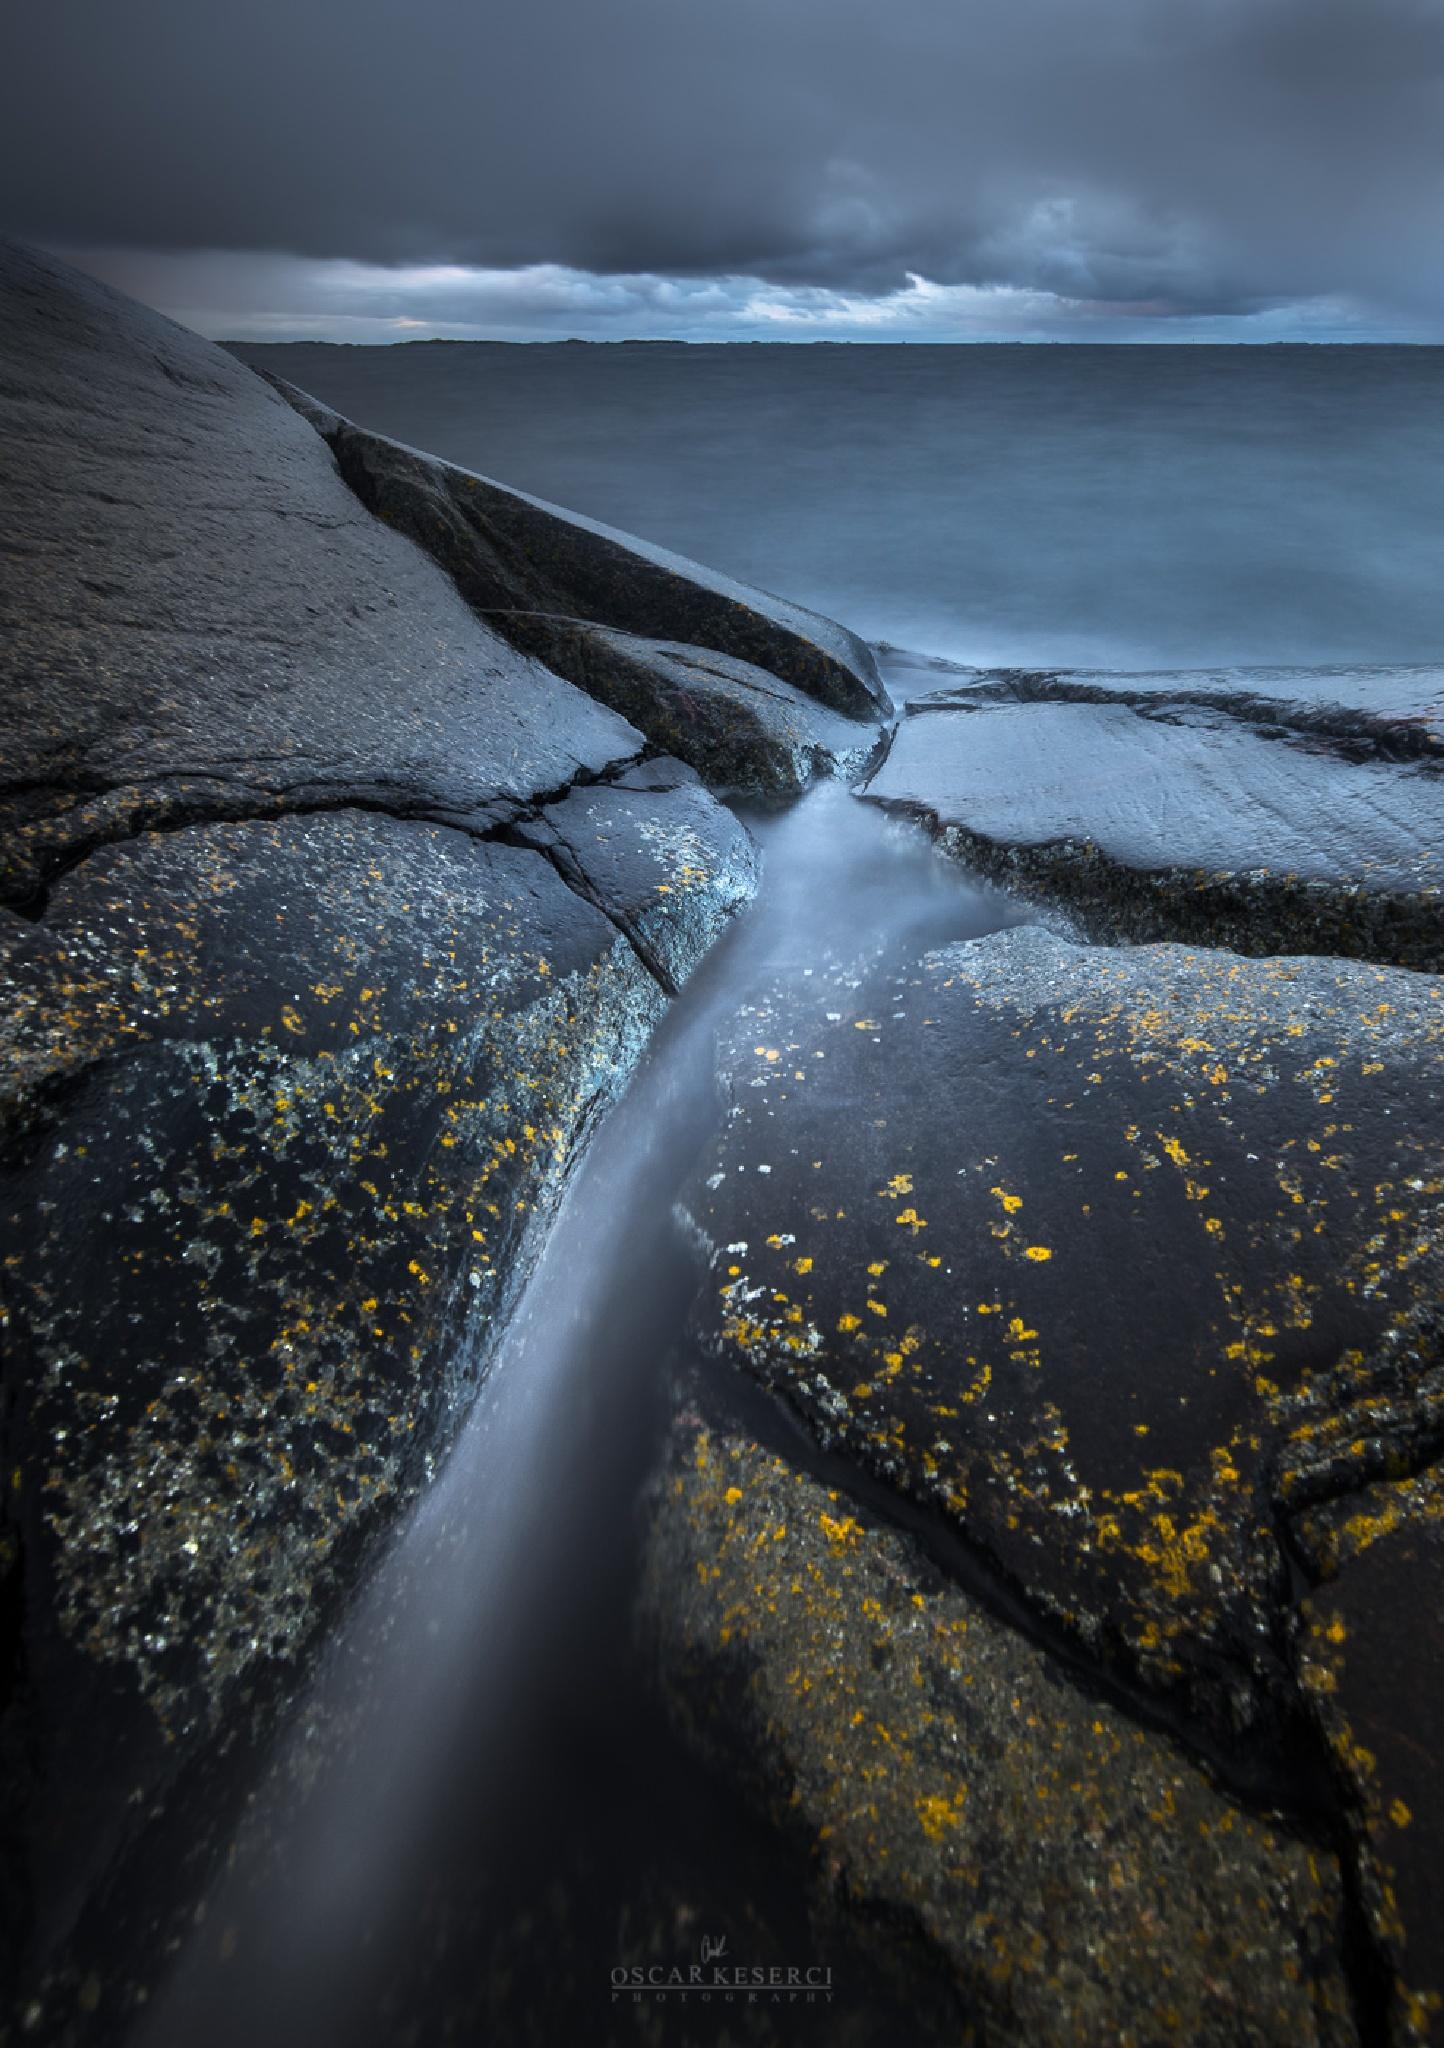 Beautiful scandinavia by oscar keserci